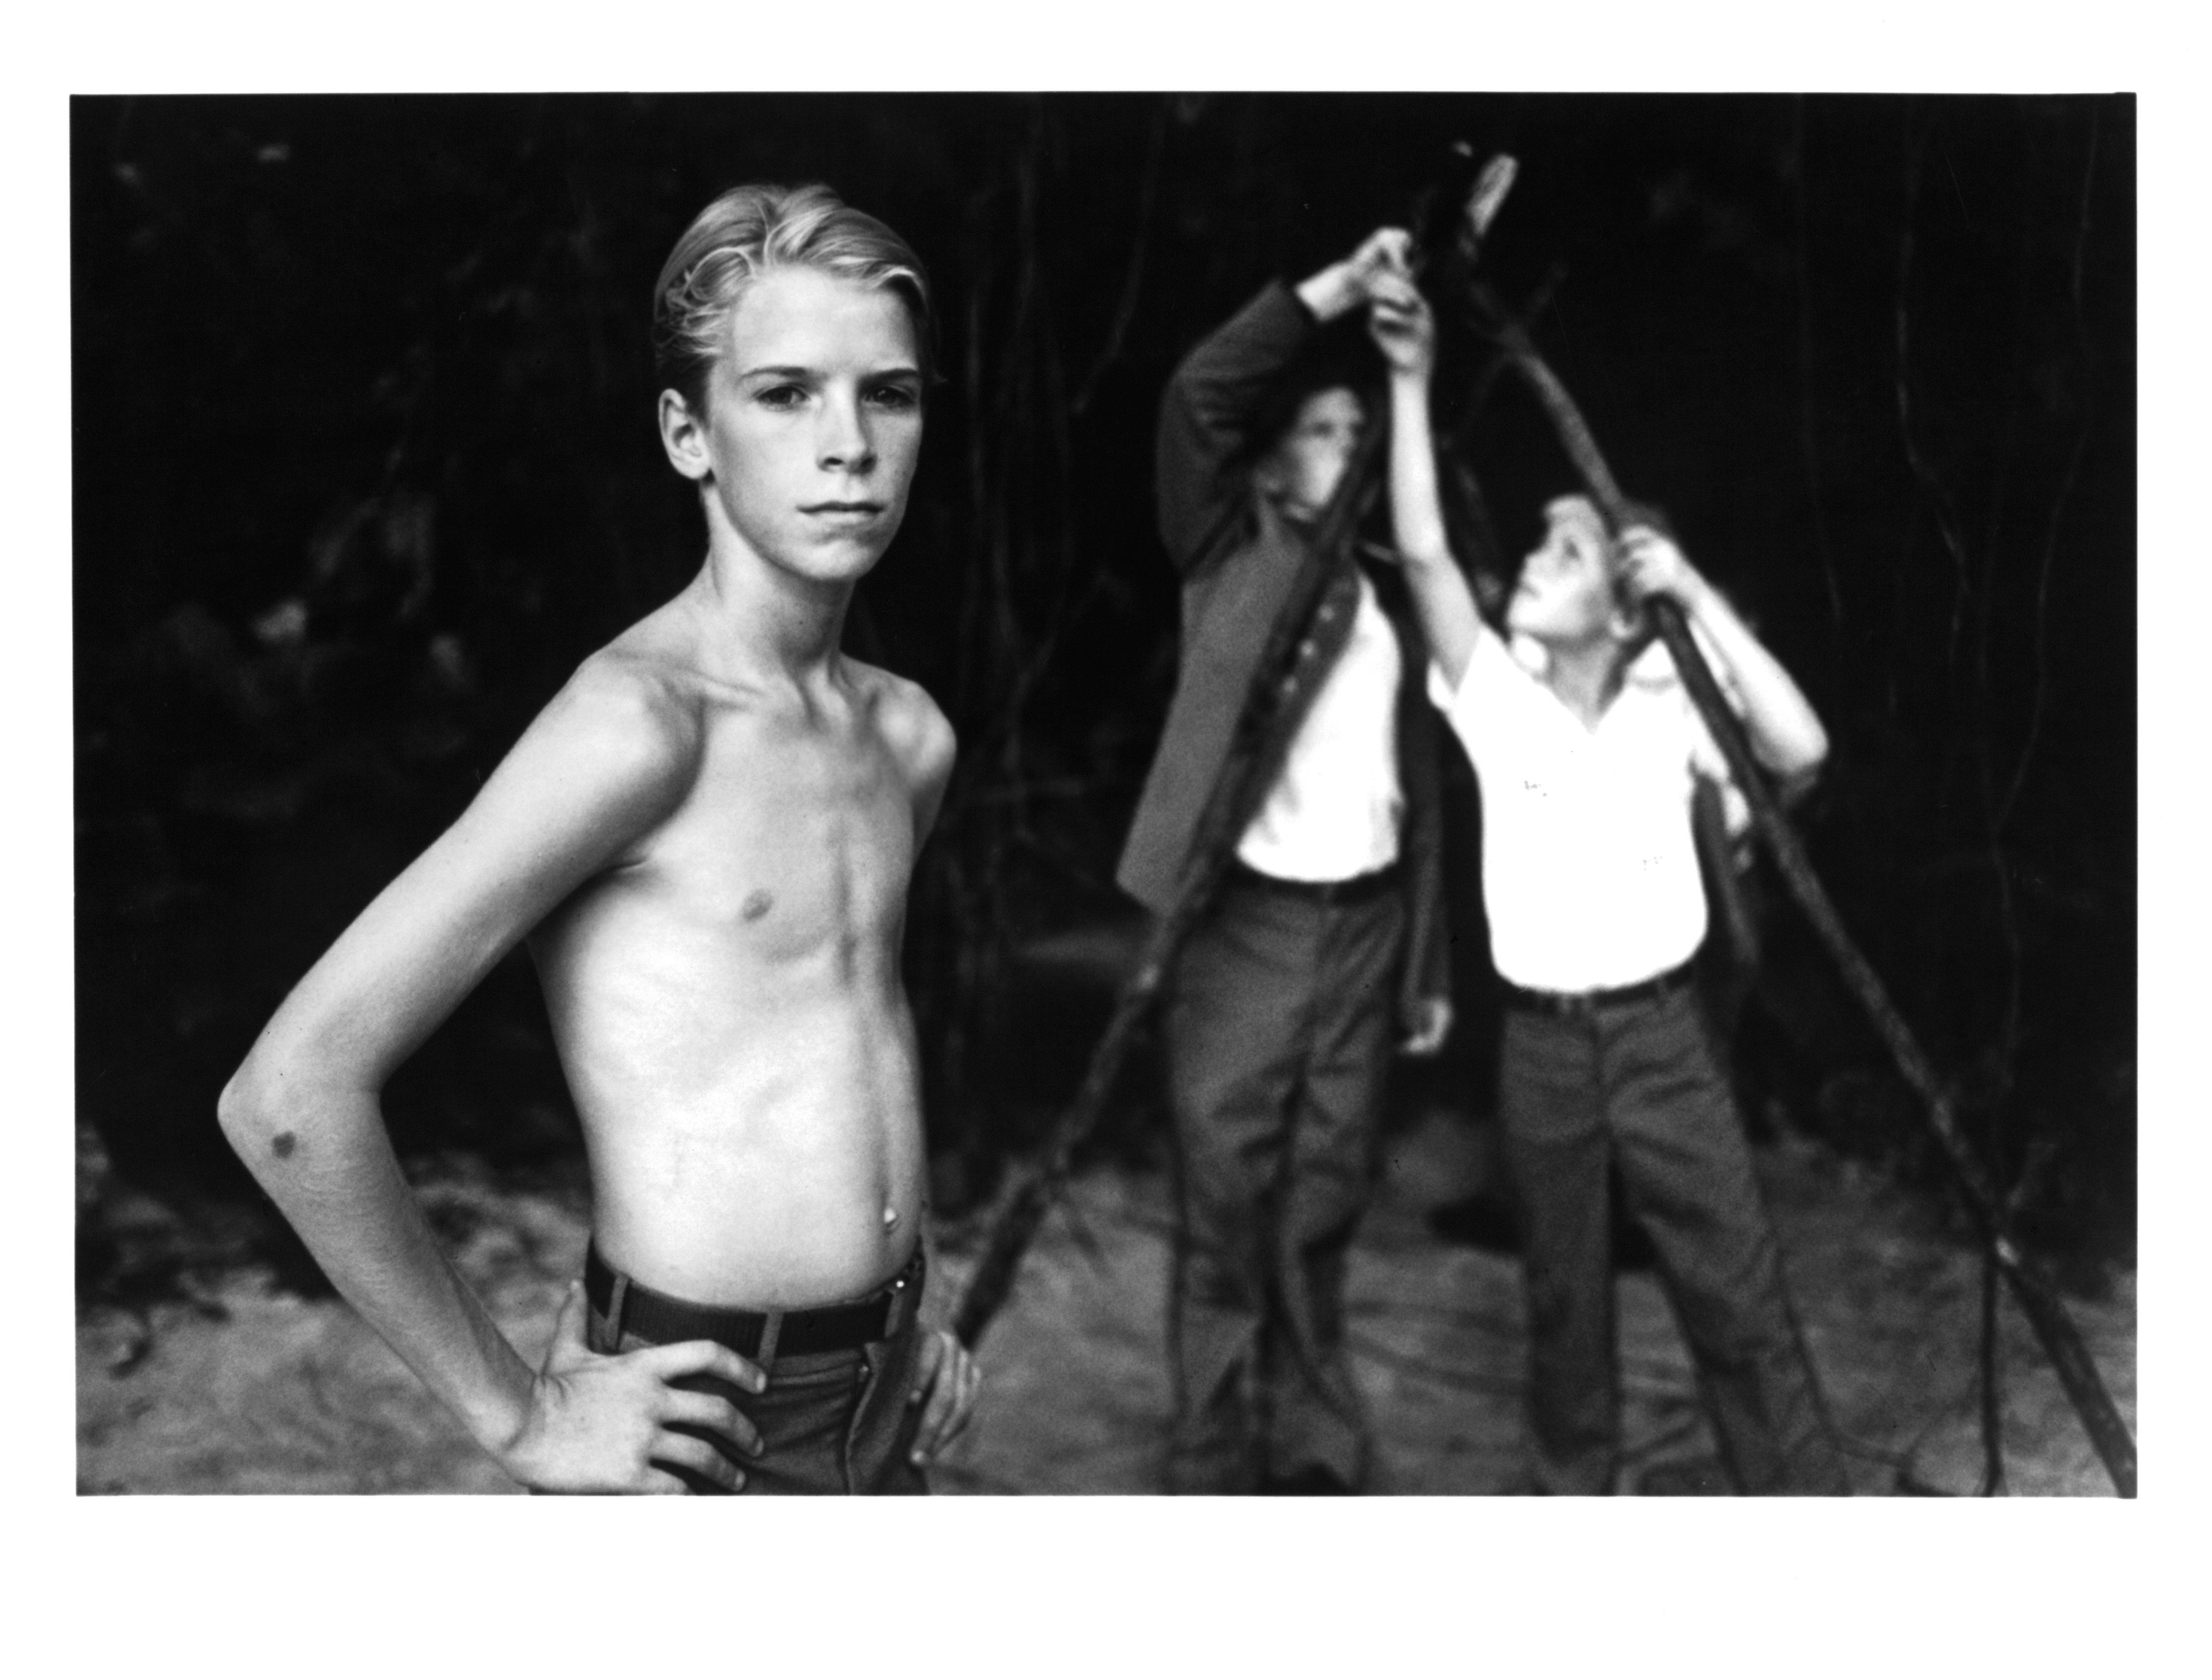 Chris Furrh stars in a scene from the 1990 movie